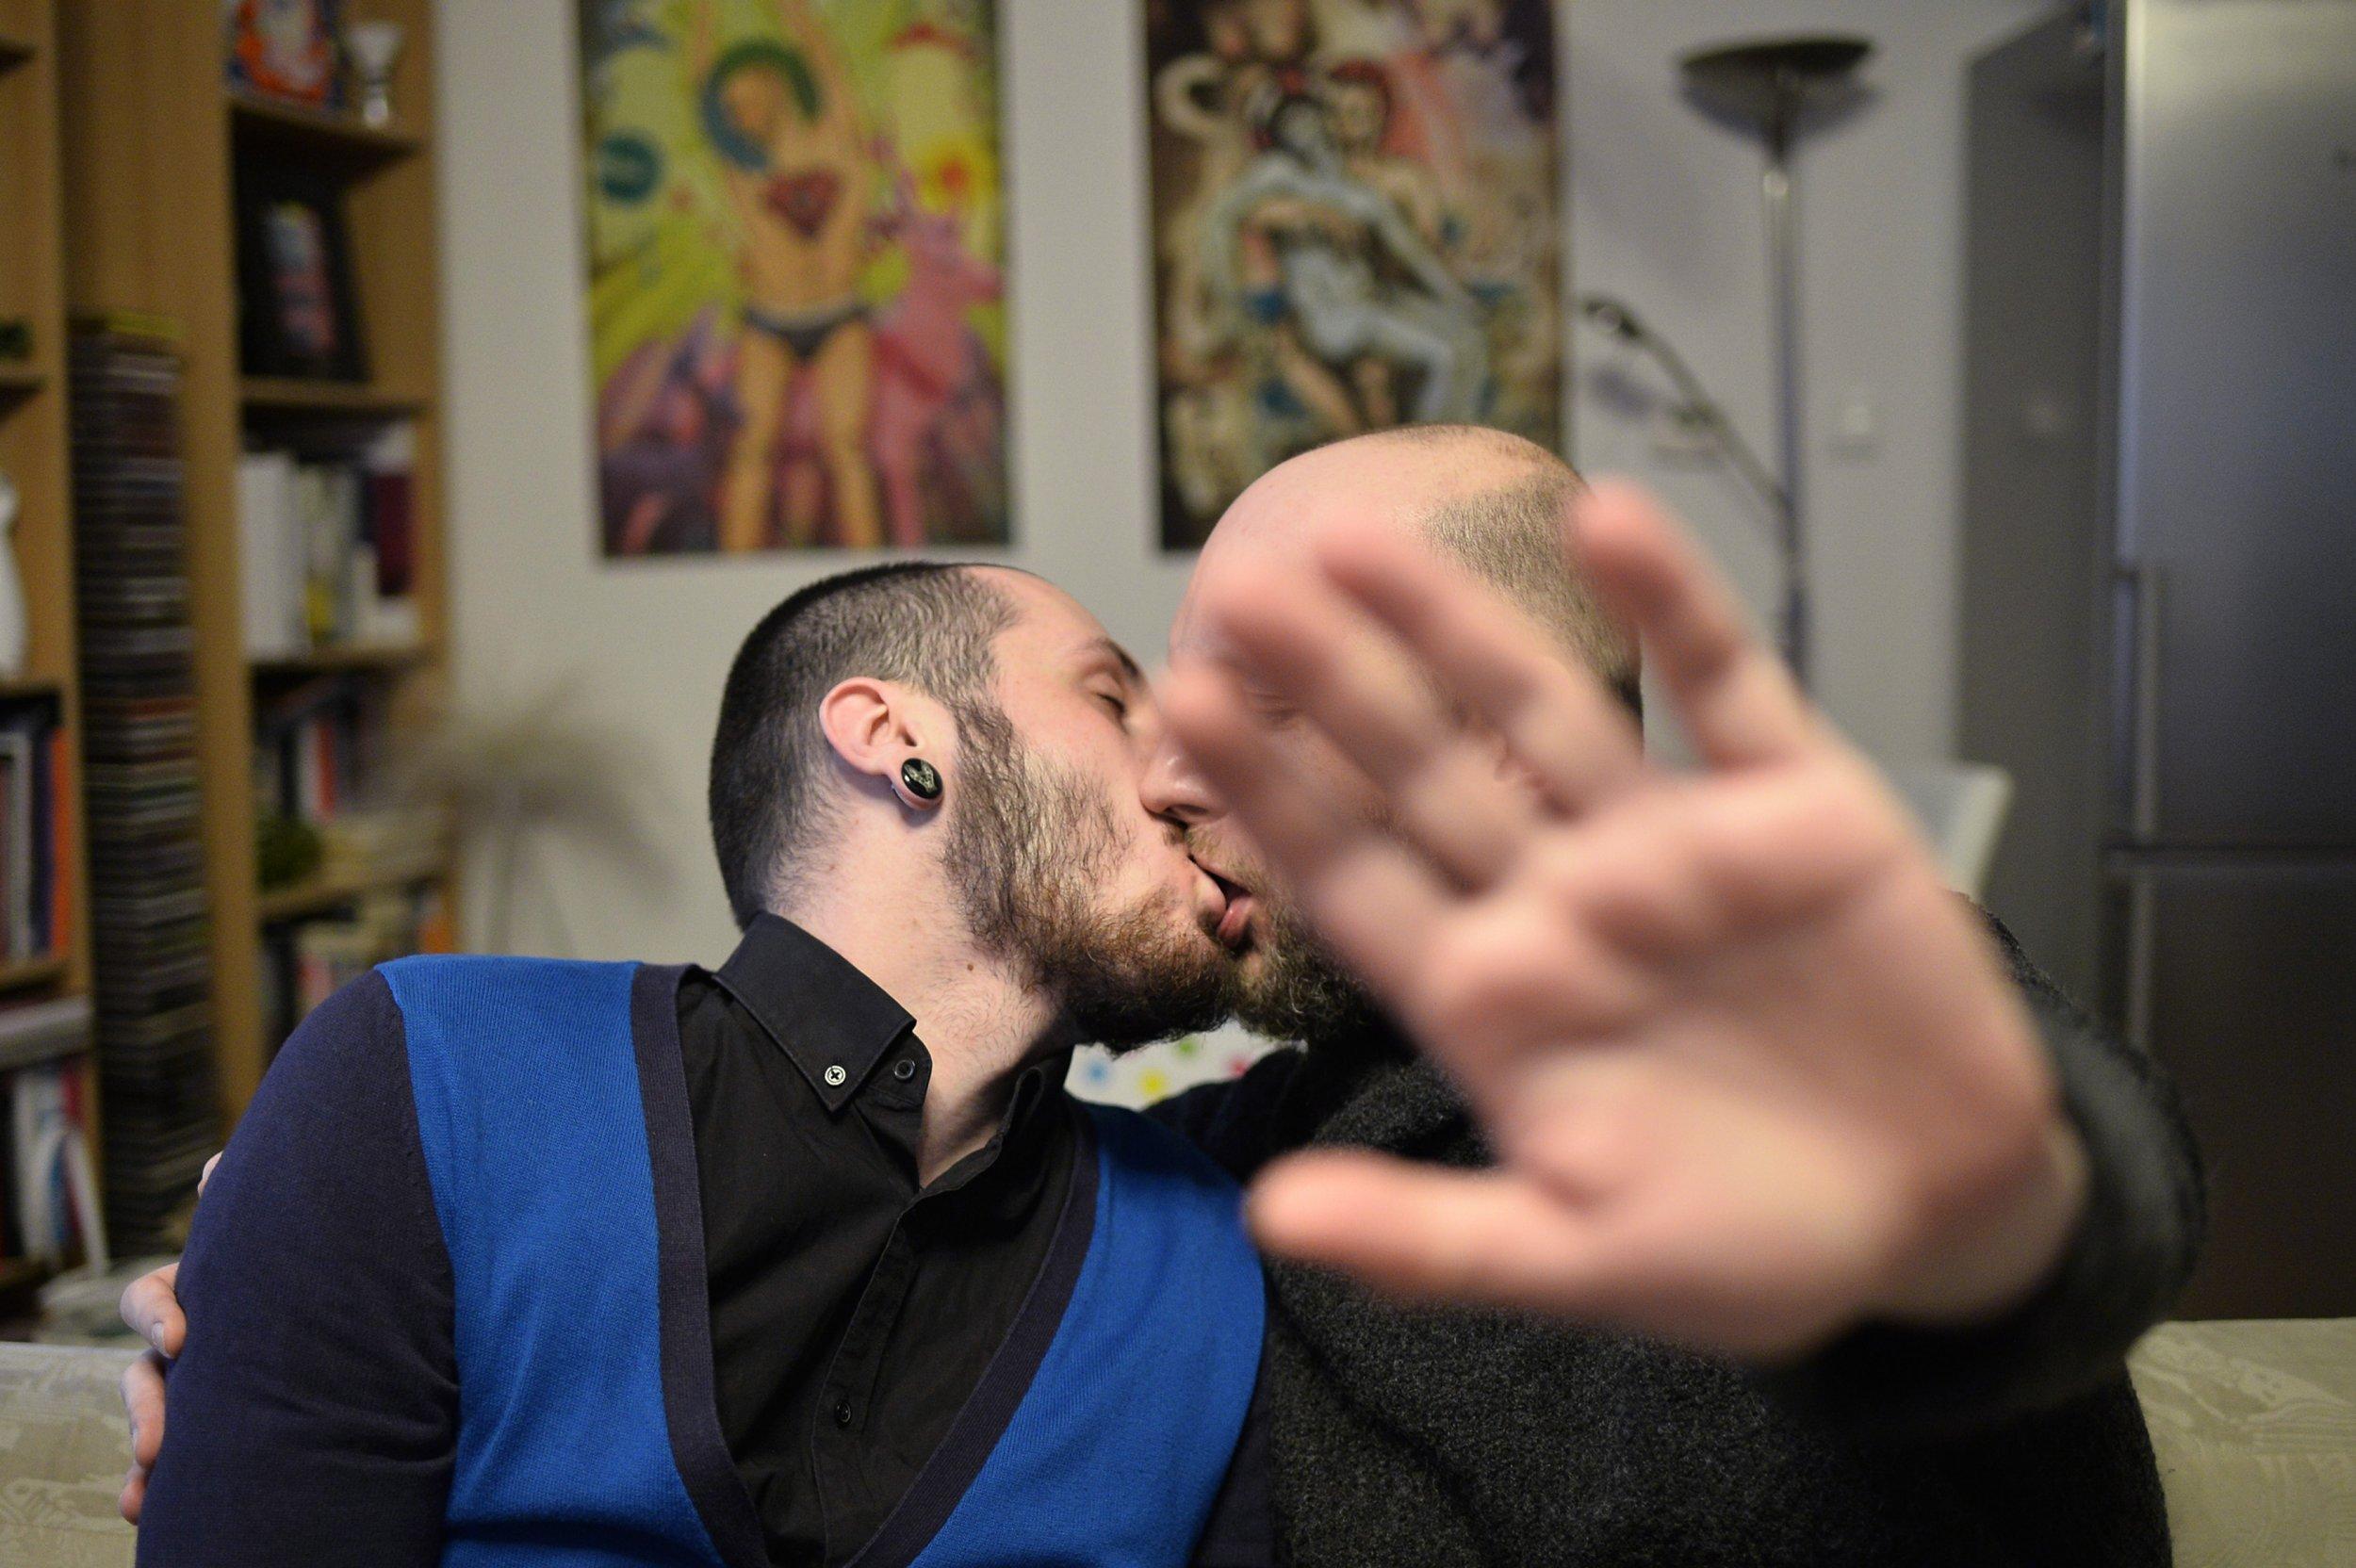 sexual love makiing